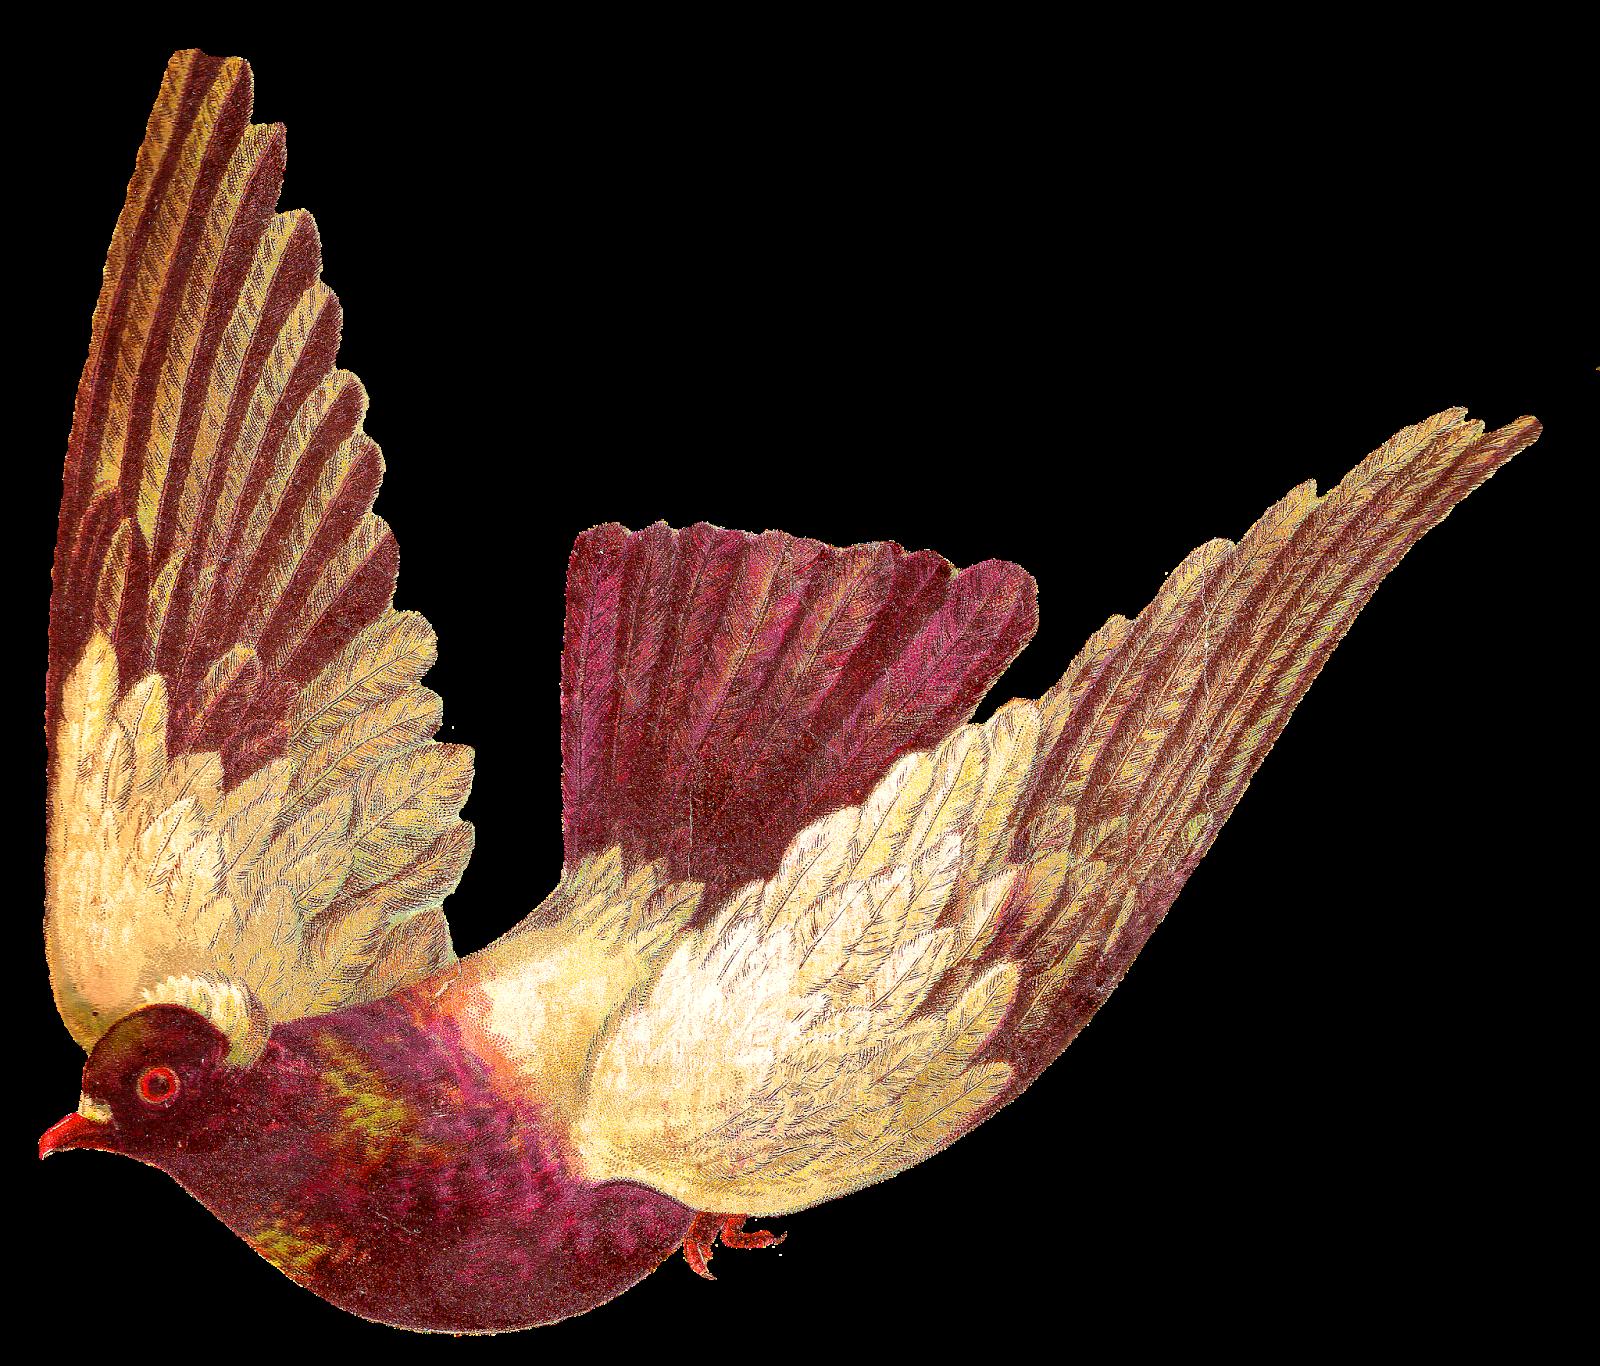 Pigeon clipart simple bird Animal Pigeon Digital Images: pigeon